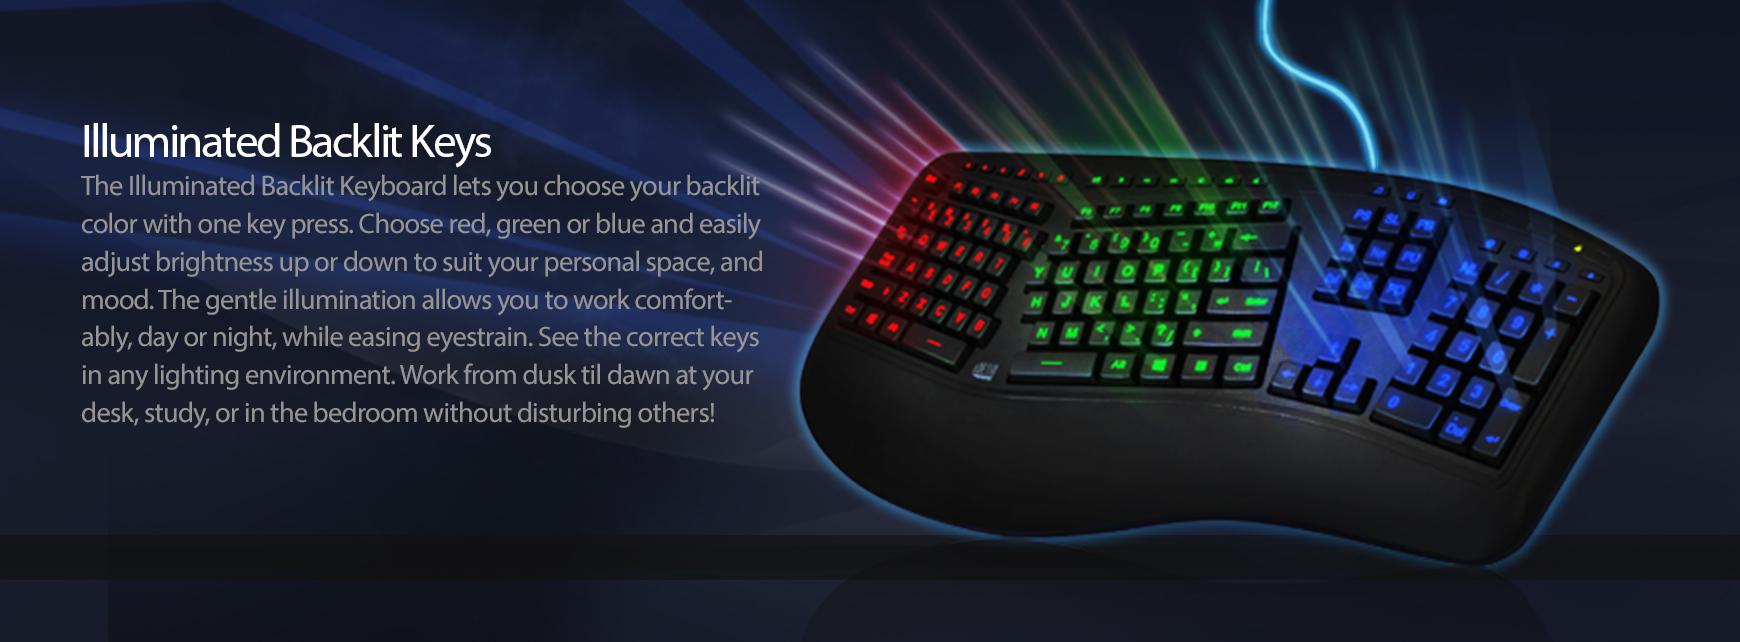 Adesso 174 Tru Form 150 3 Color Illuminated Ergonomic Keyboard Adesso